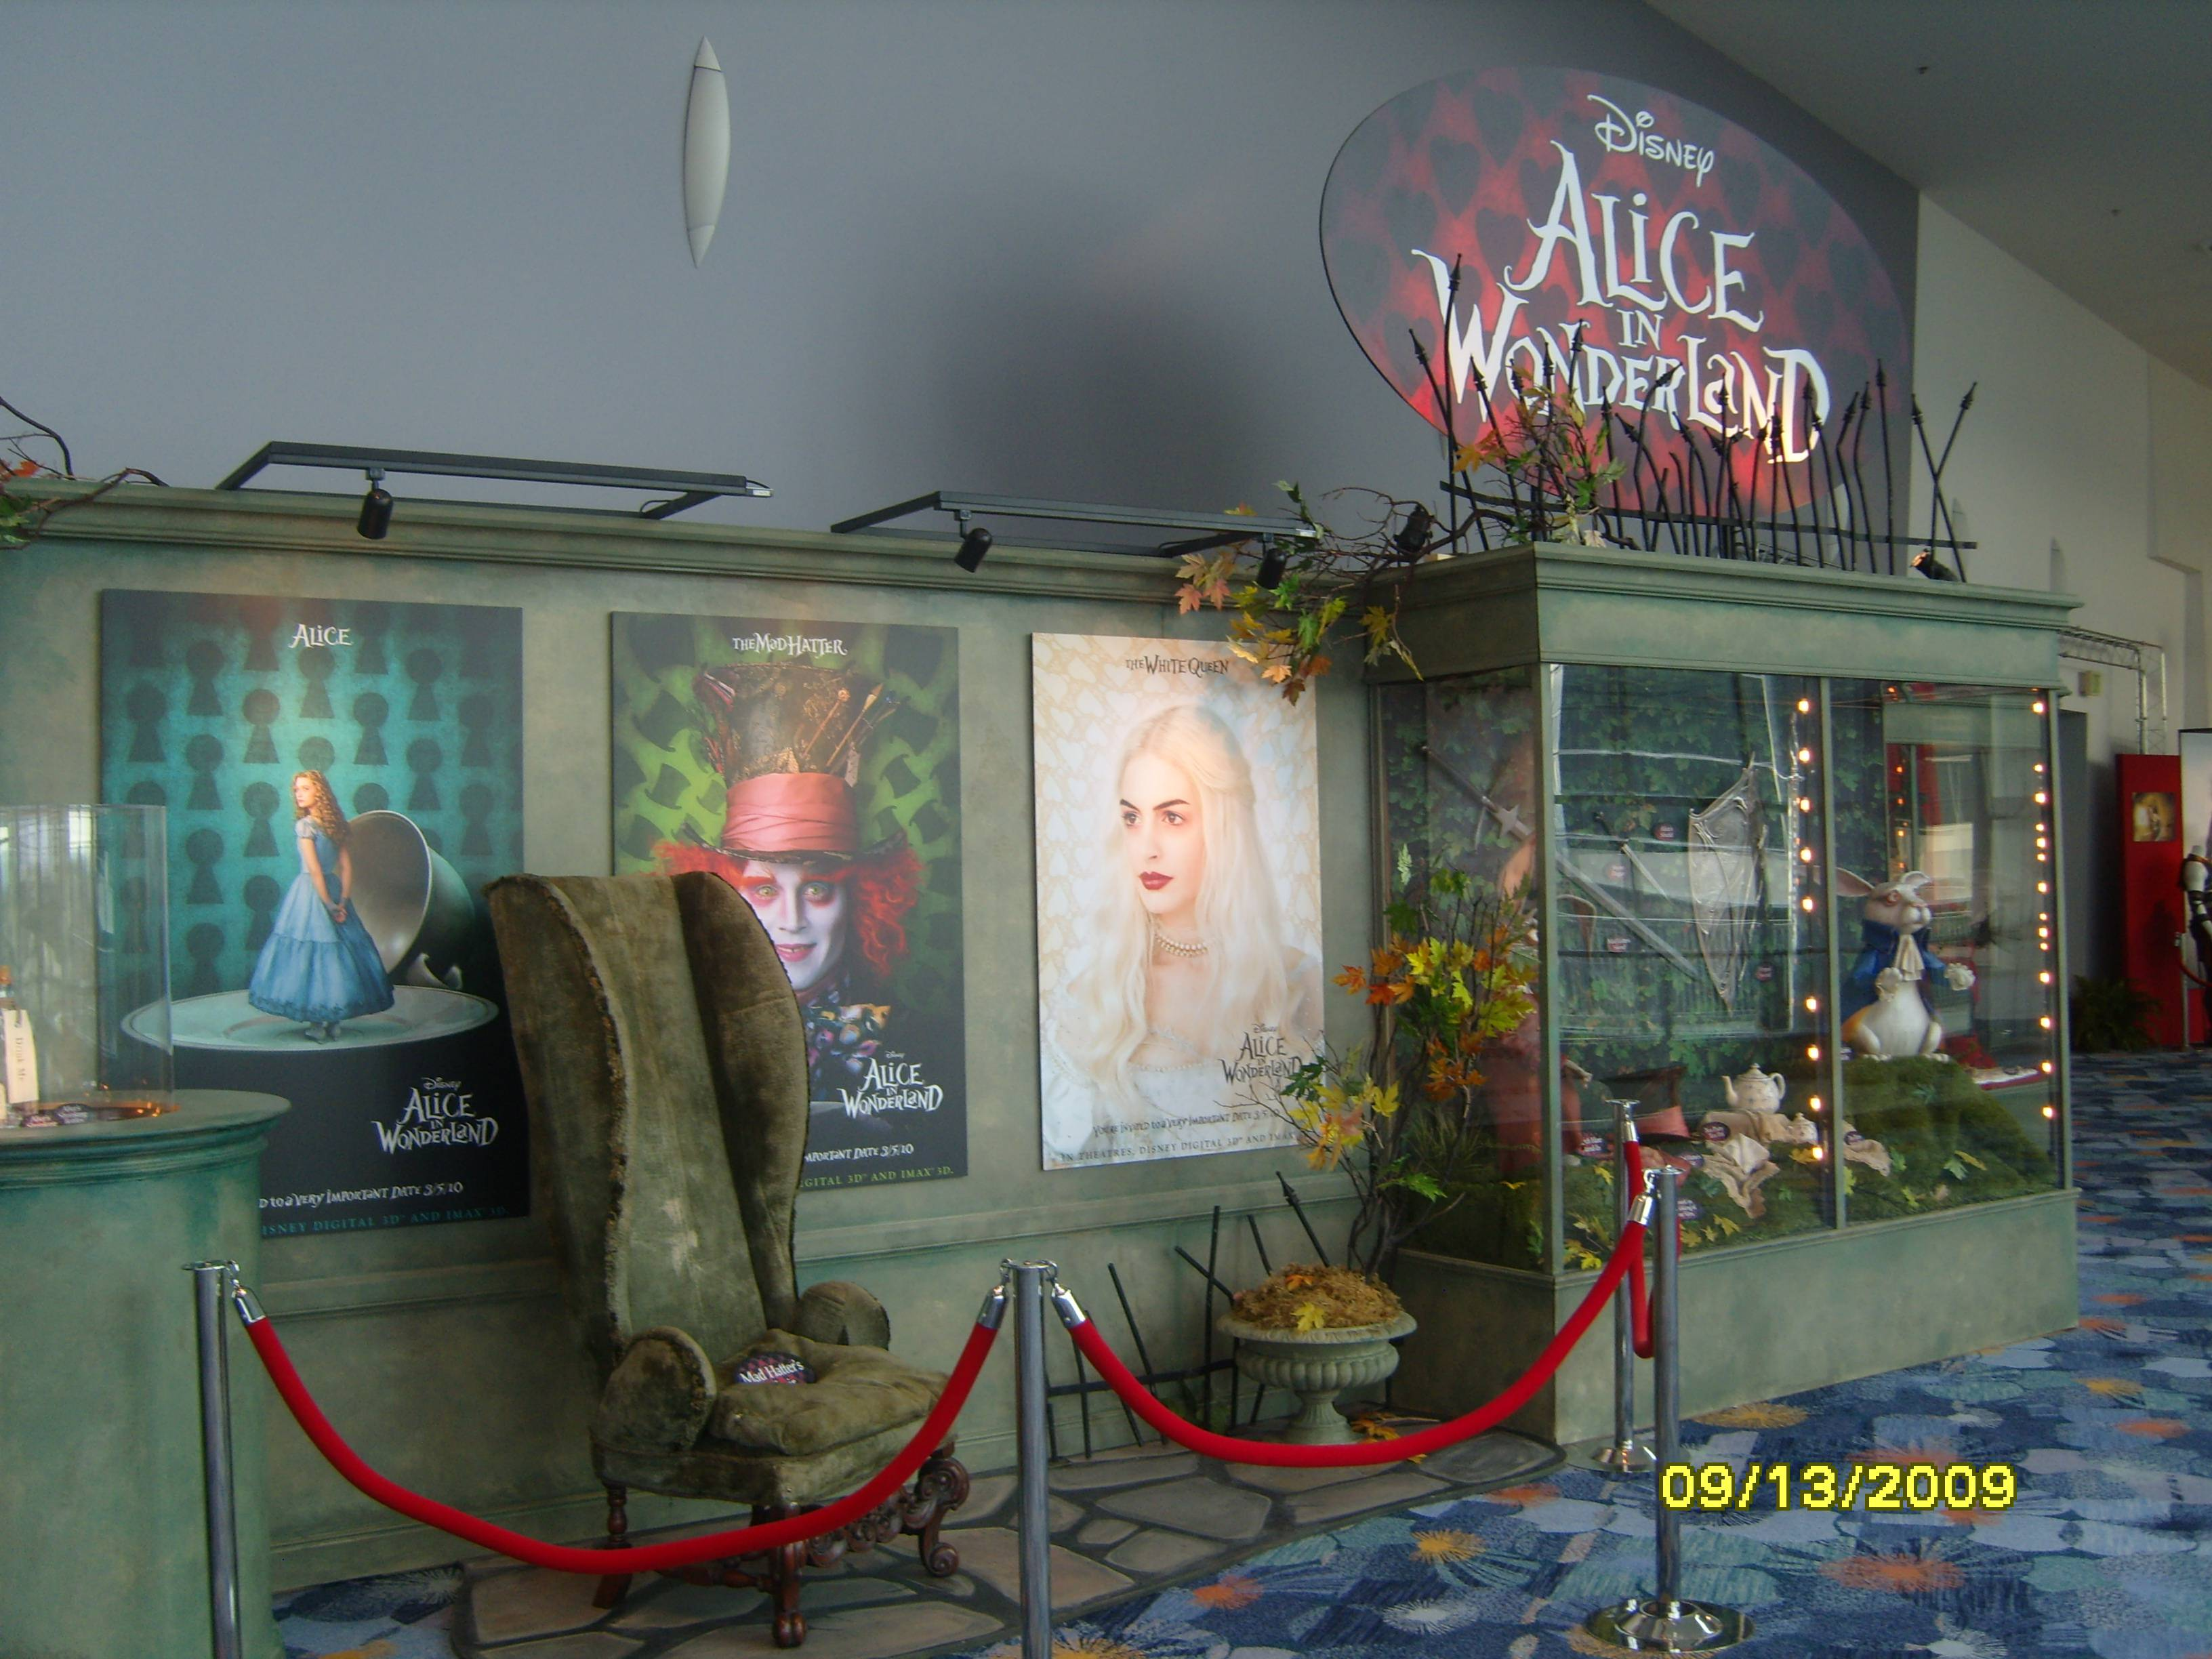 D23 Expo: Alice in Wonderland